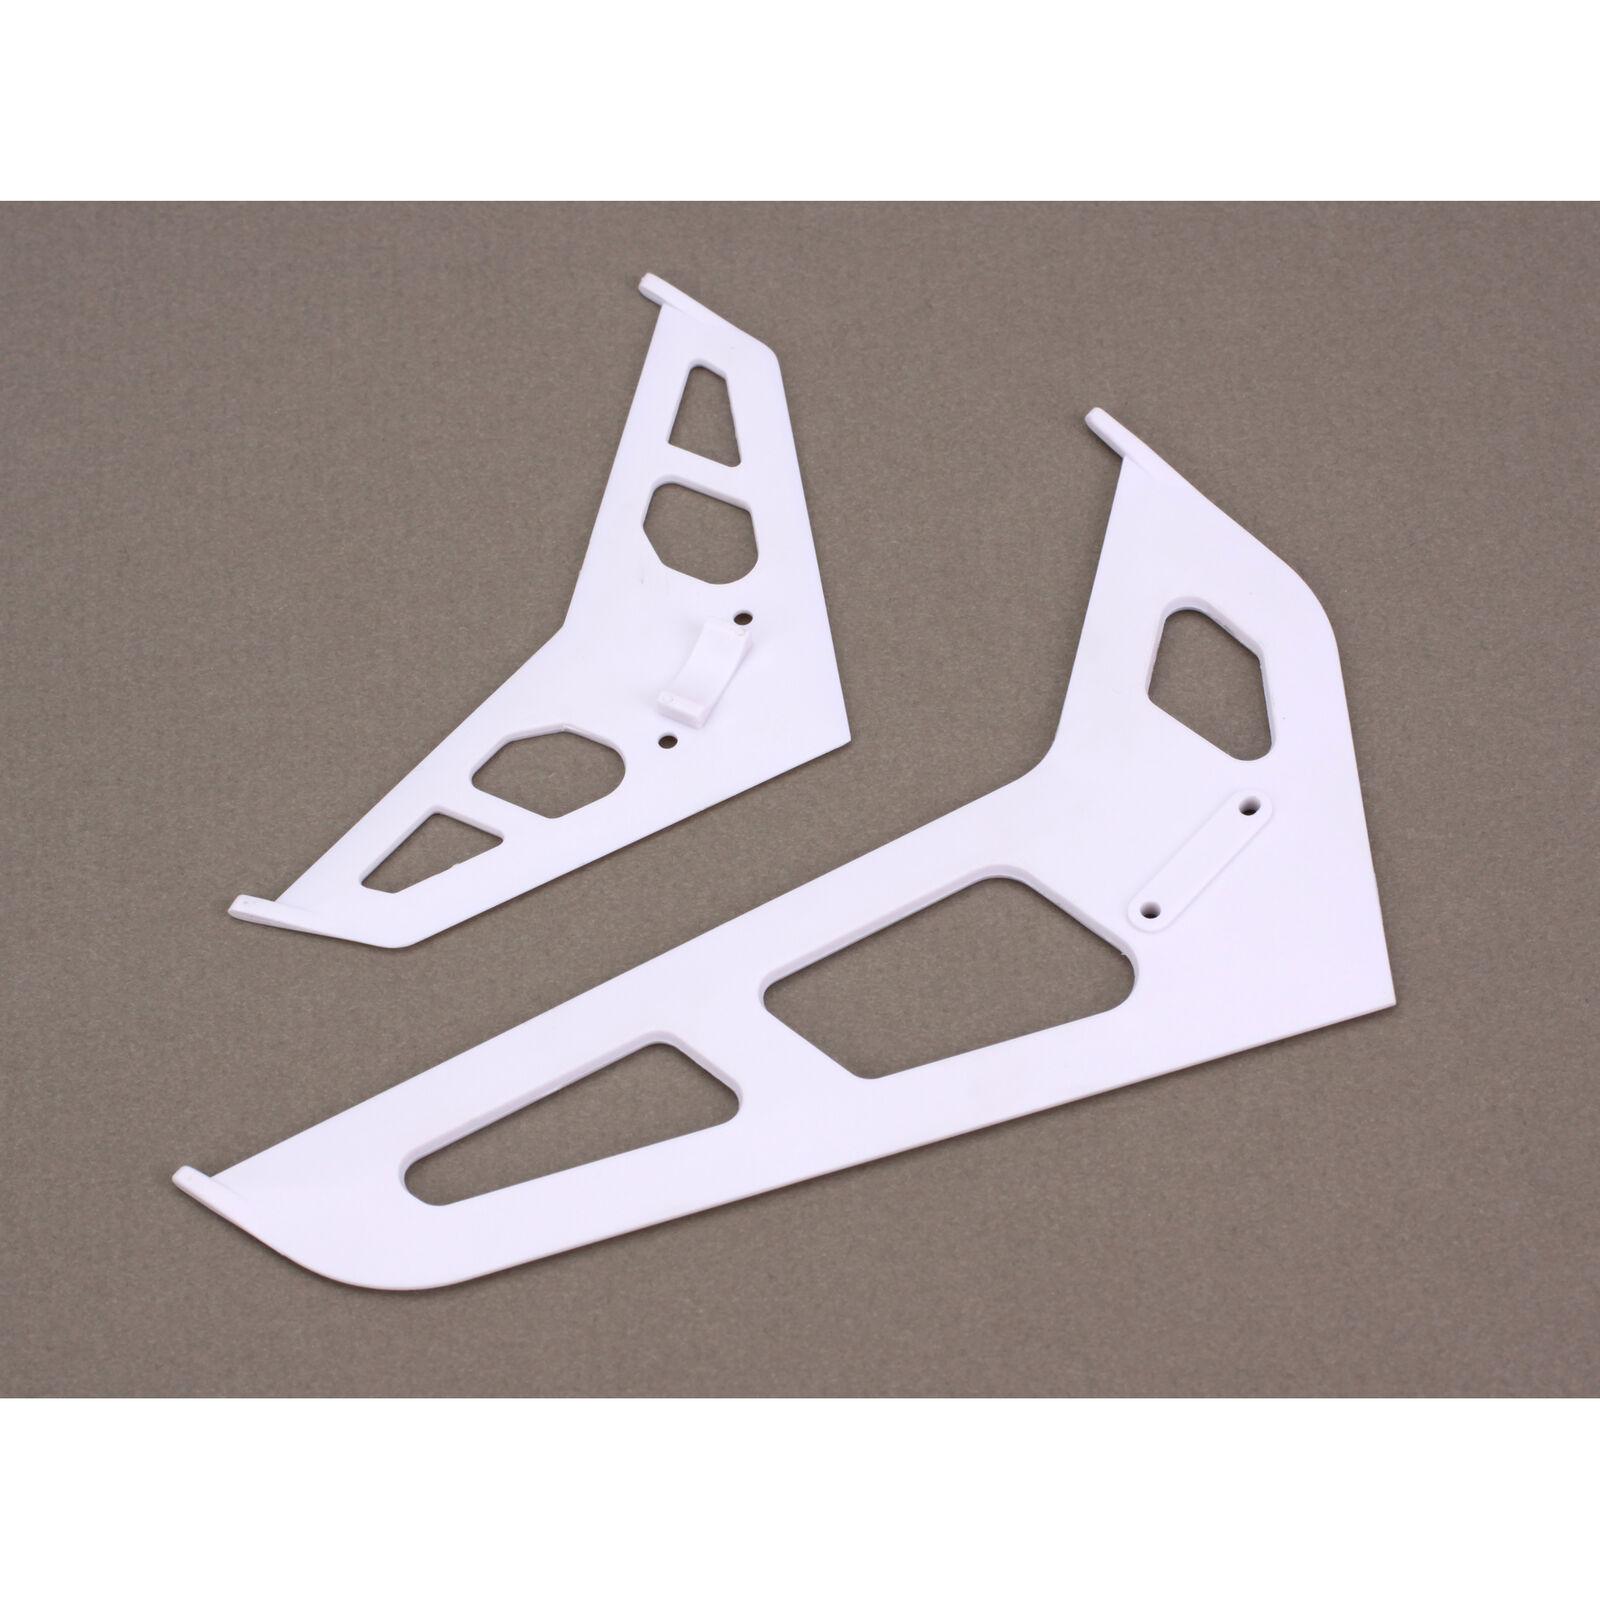 Stabilizer/Fin Set, White: B450, 330X, 330S